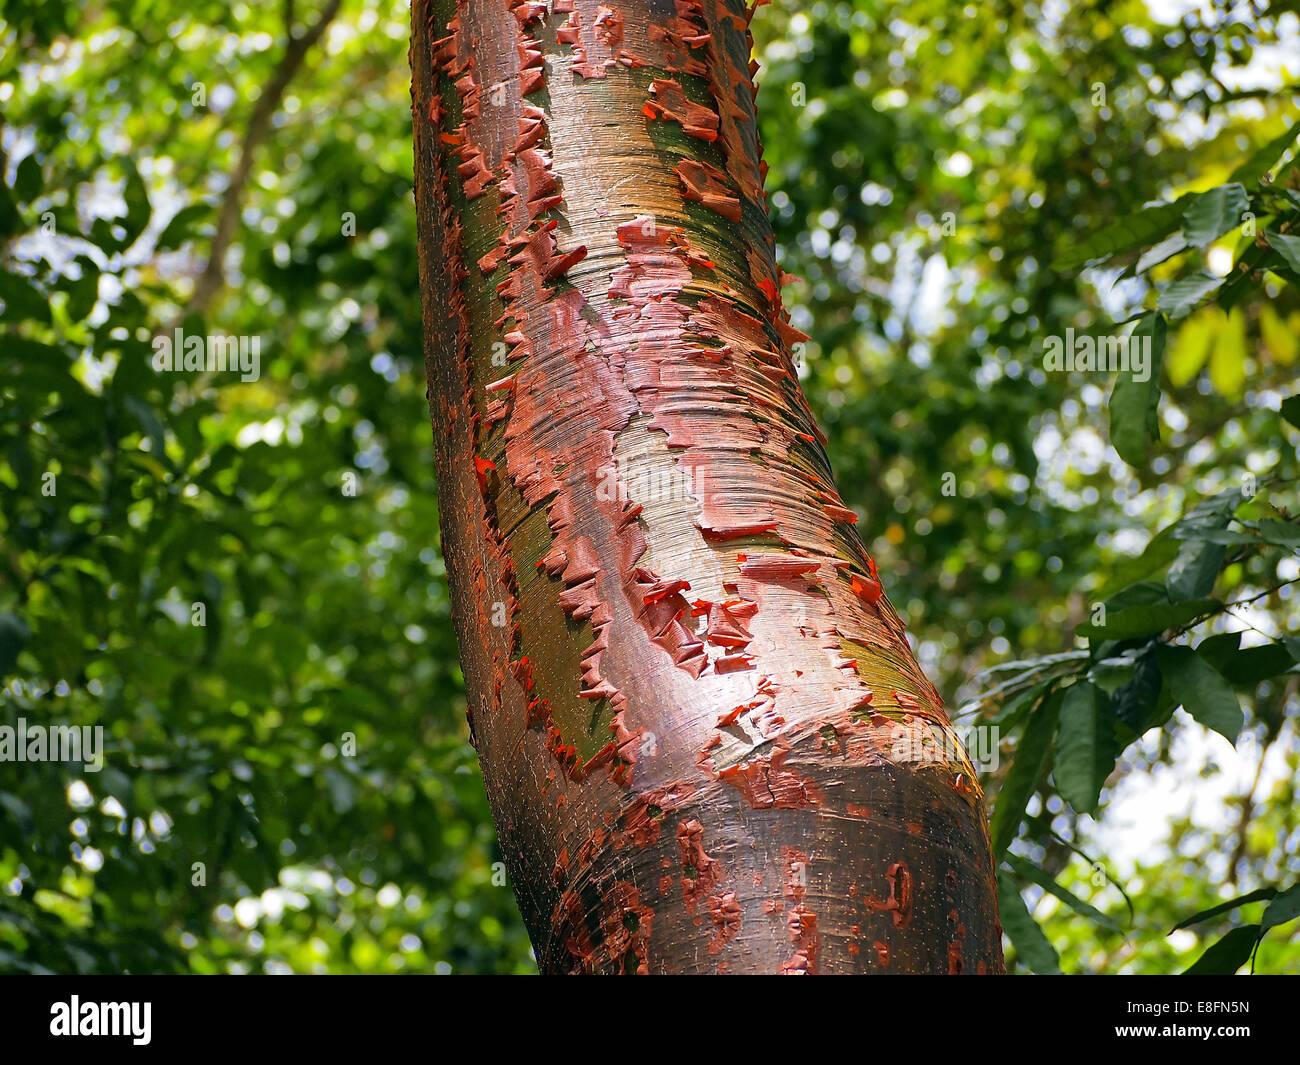 Gumbo-limbo tree with red bark and peeling - Stock Image